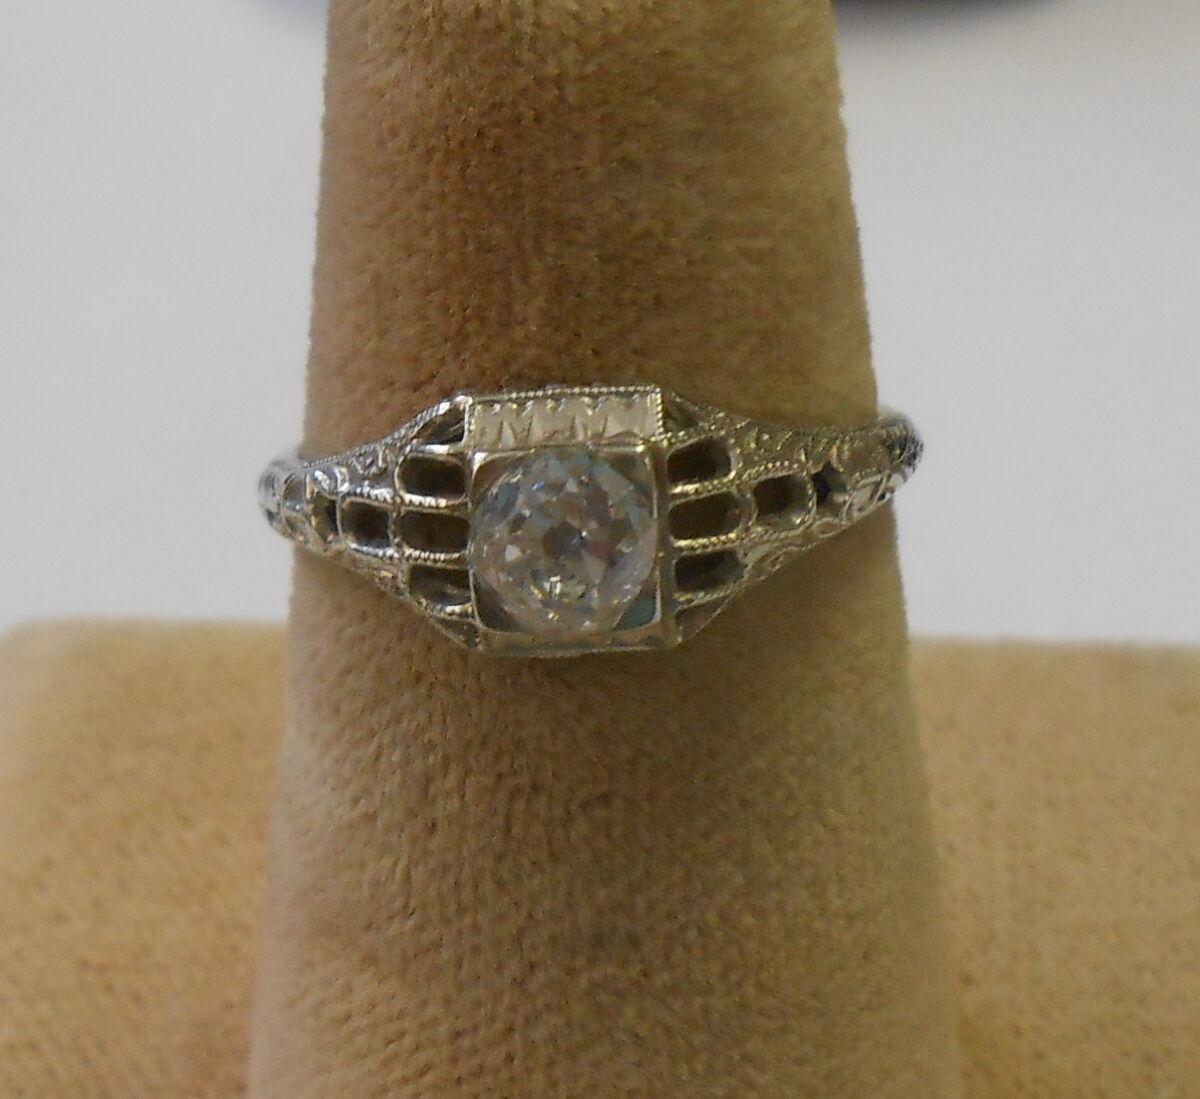 Very Rare Antique 19K White gold 43 Point Mine Cut Diamond Ring Size 5.5